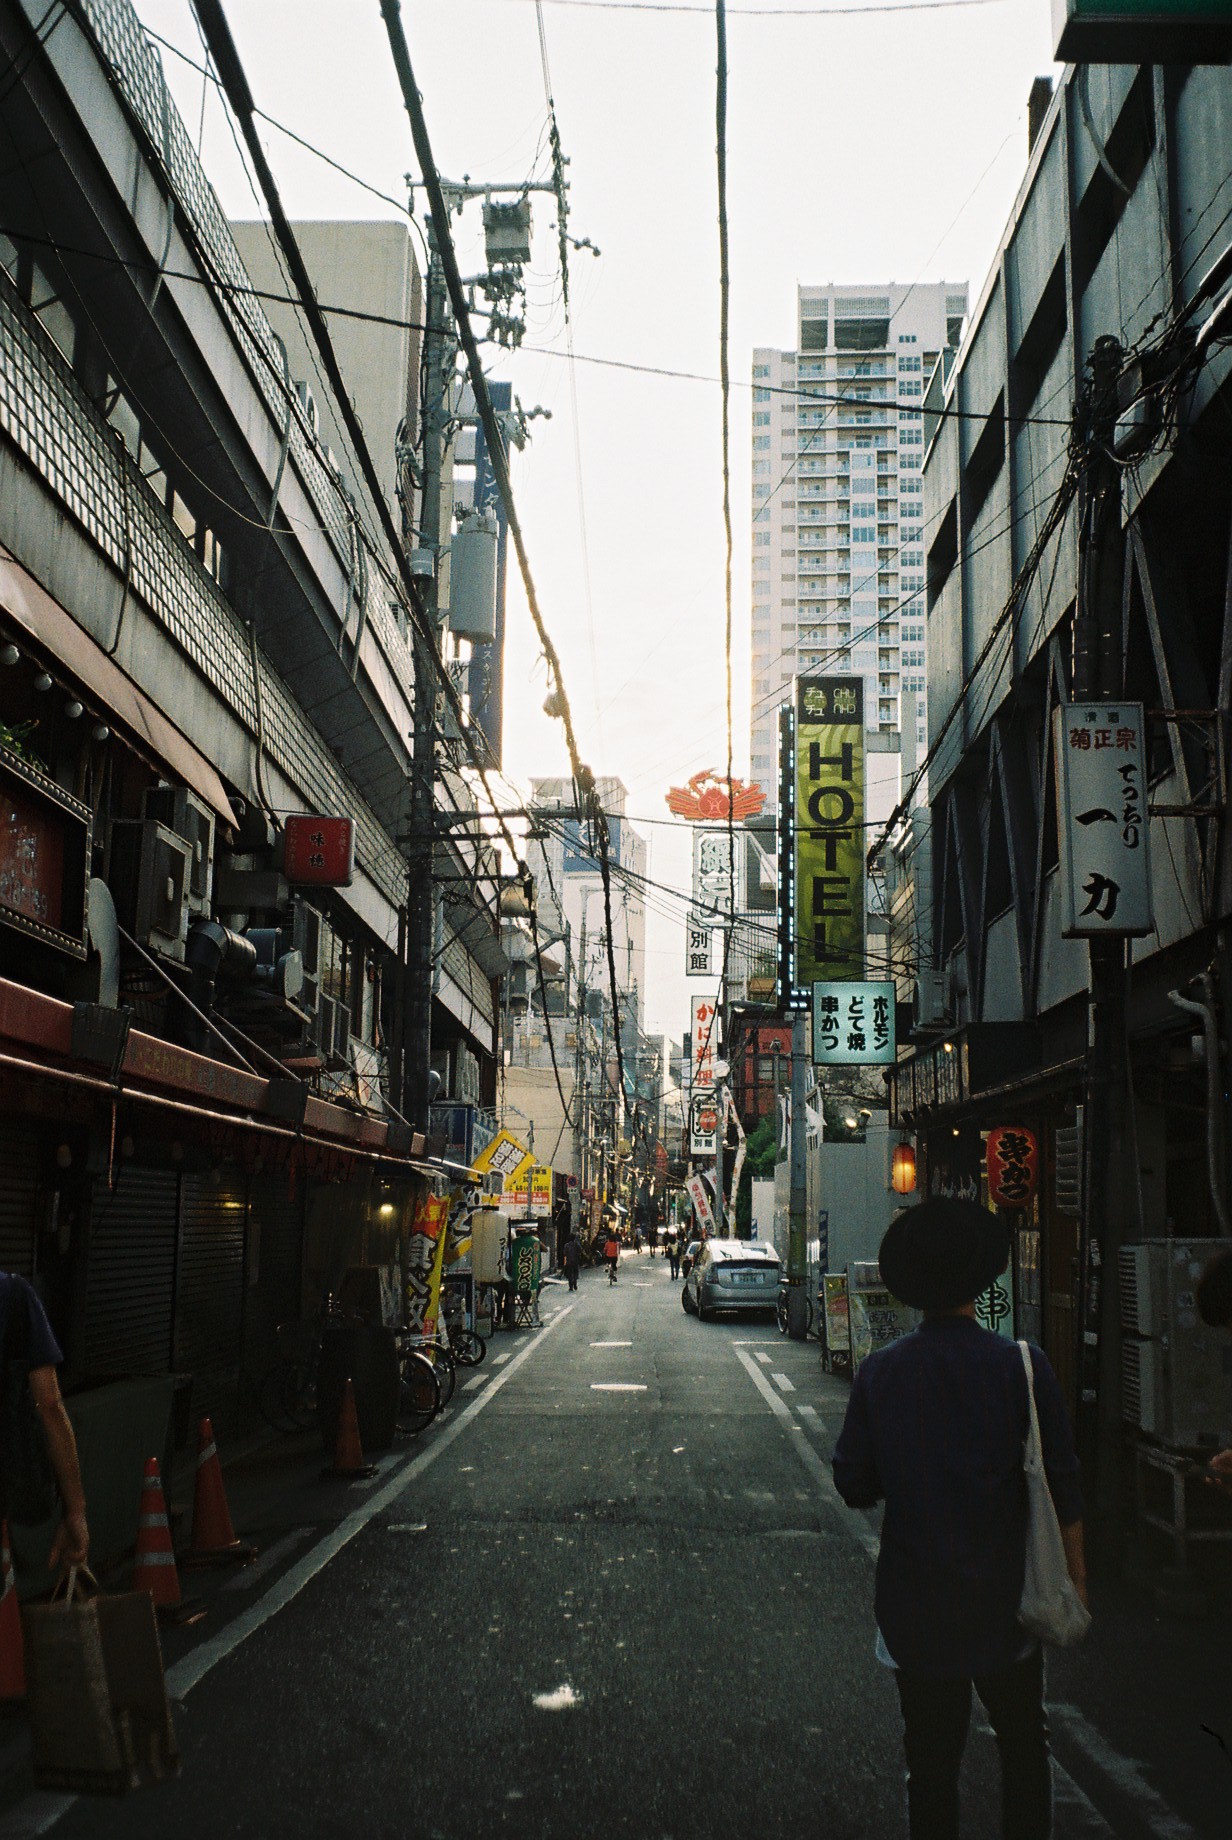 03-JAPON-argentic-Osaka-aout-2016-037.JPG